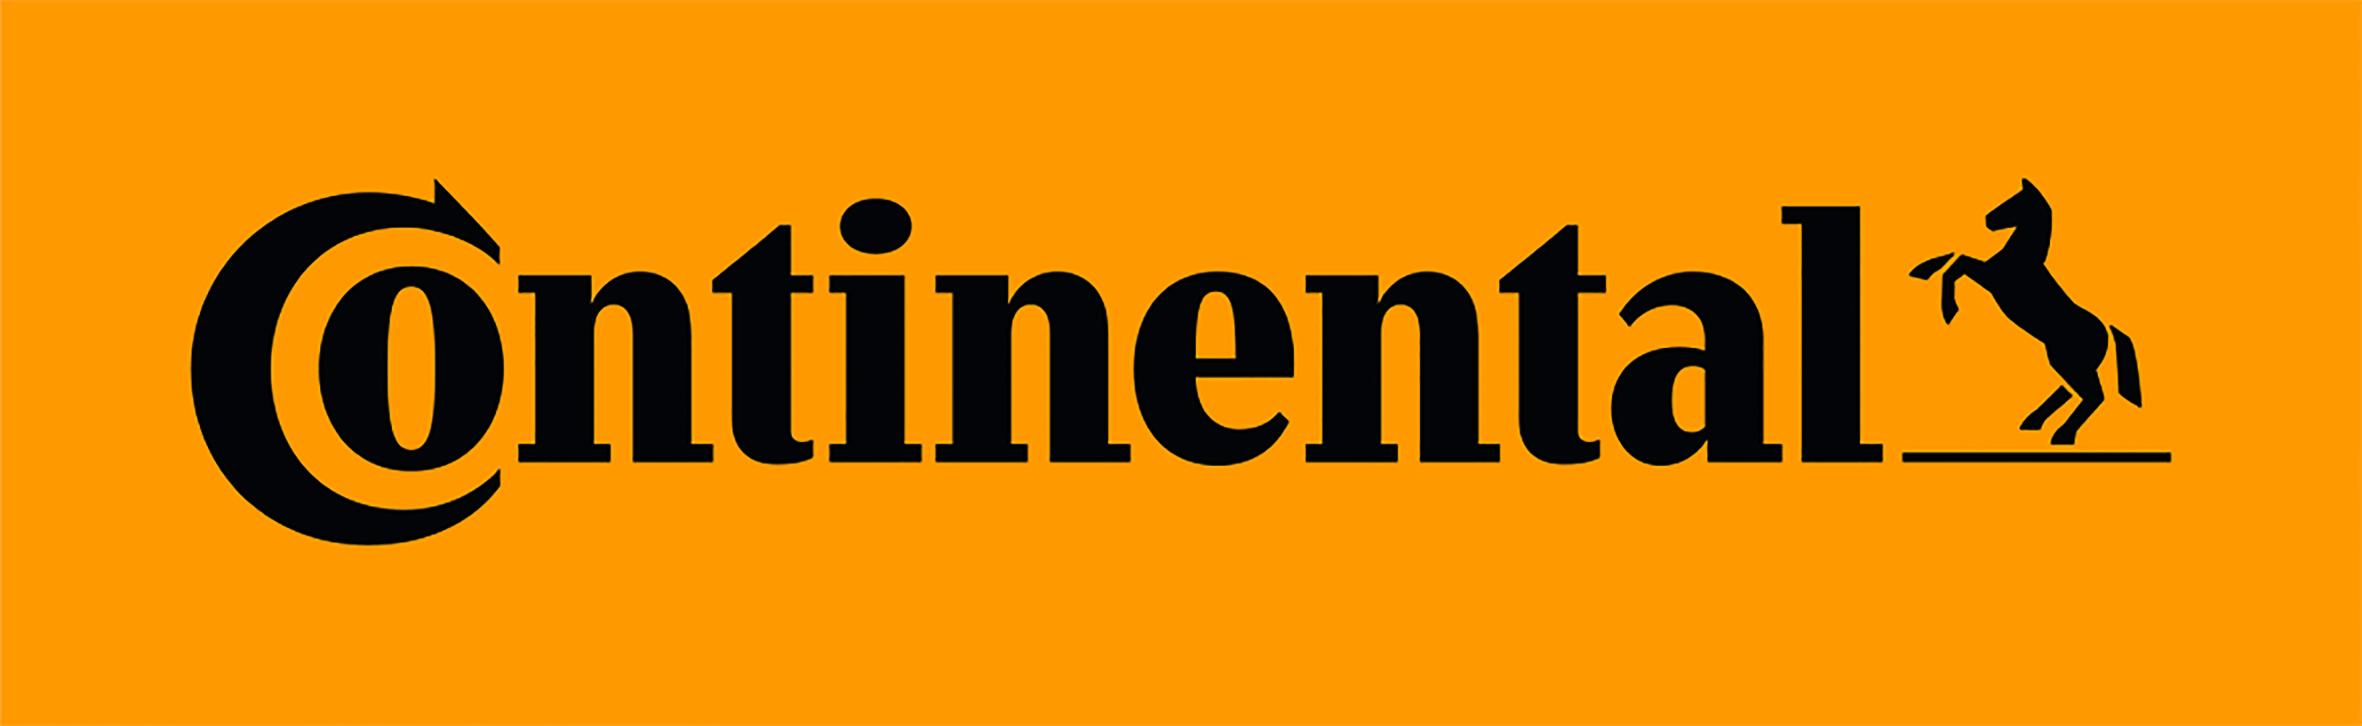 Continental_Logo_1564994833.jpg